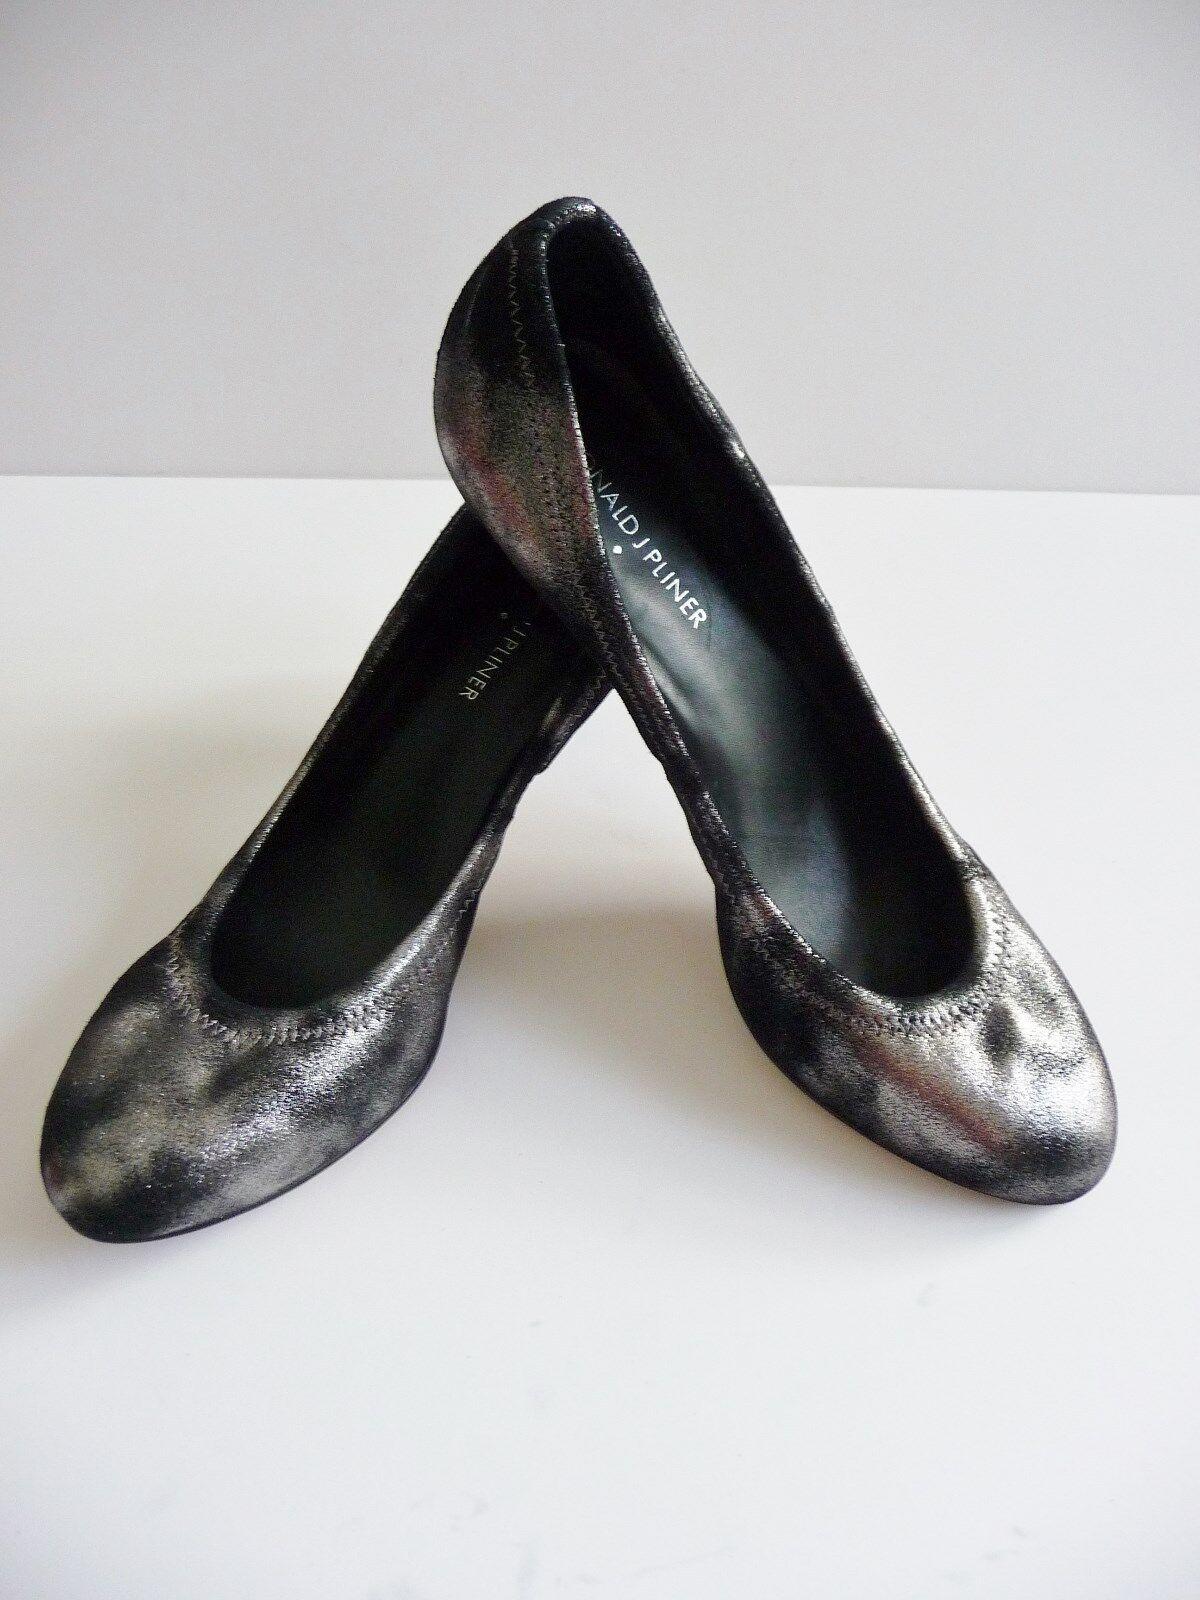 Donald Donald Donald J Pliner NIB Pewter Blk Dusted Metallic Suede Heels Pump Size 8.5 B  198 33b828